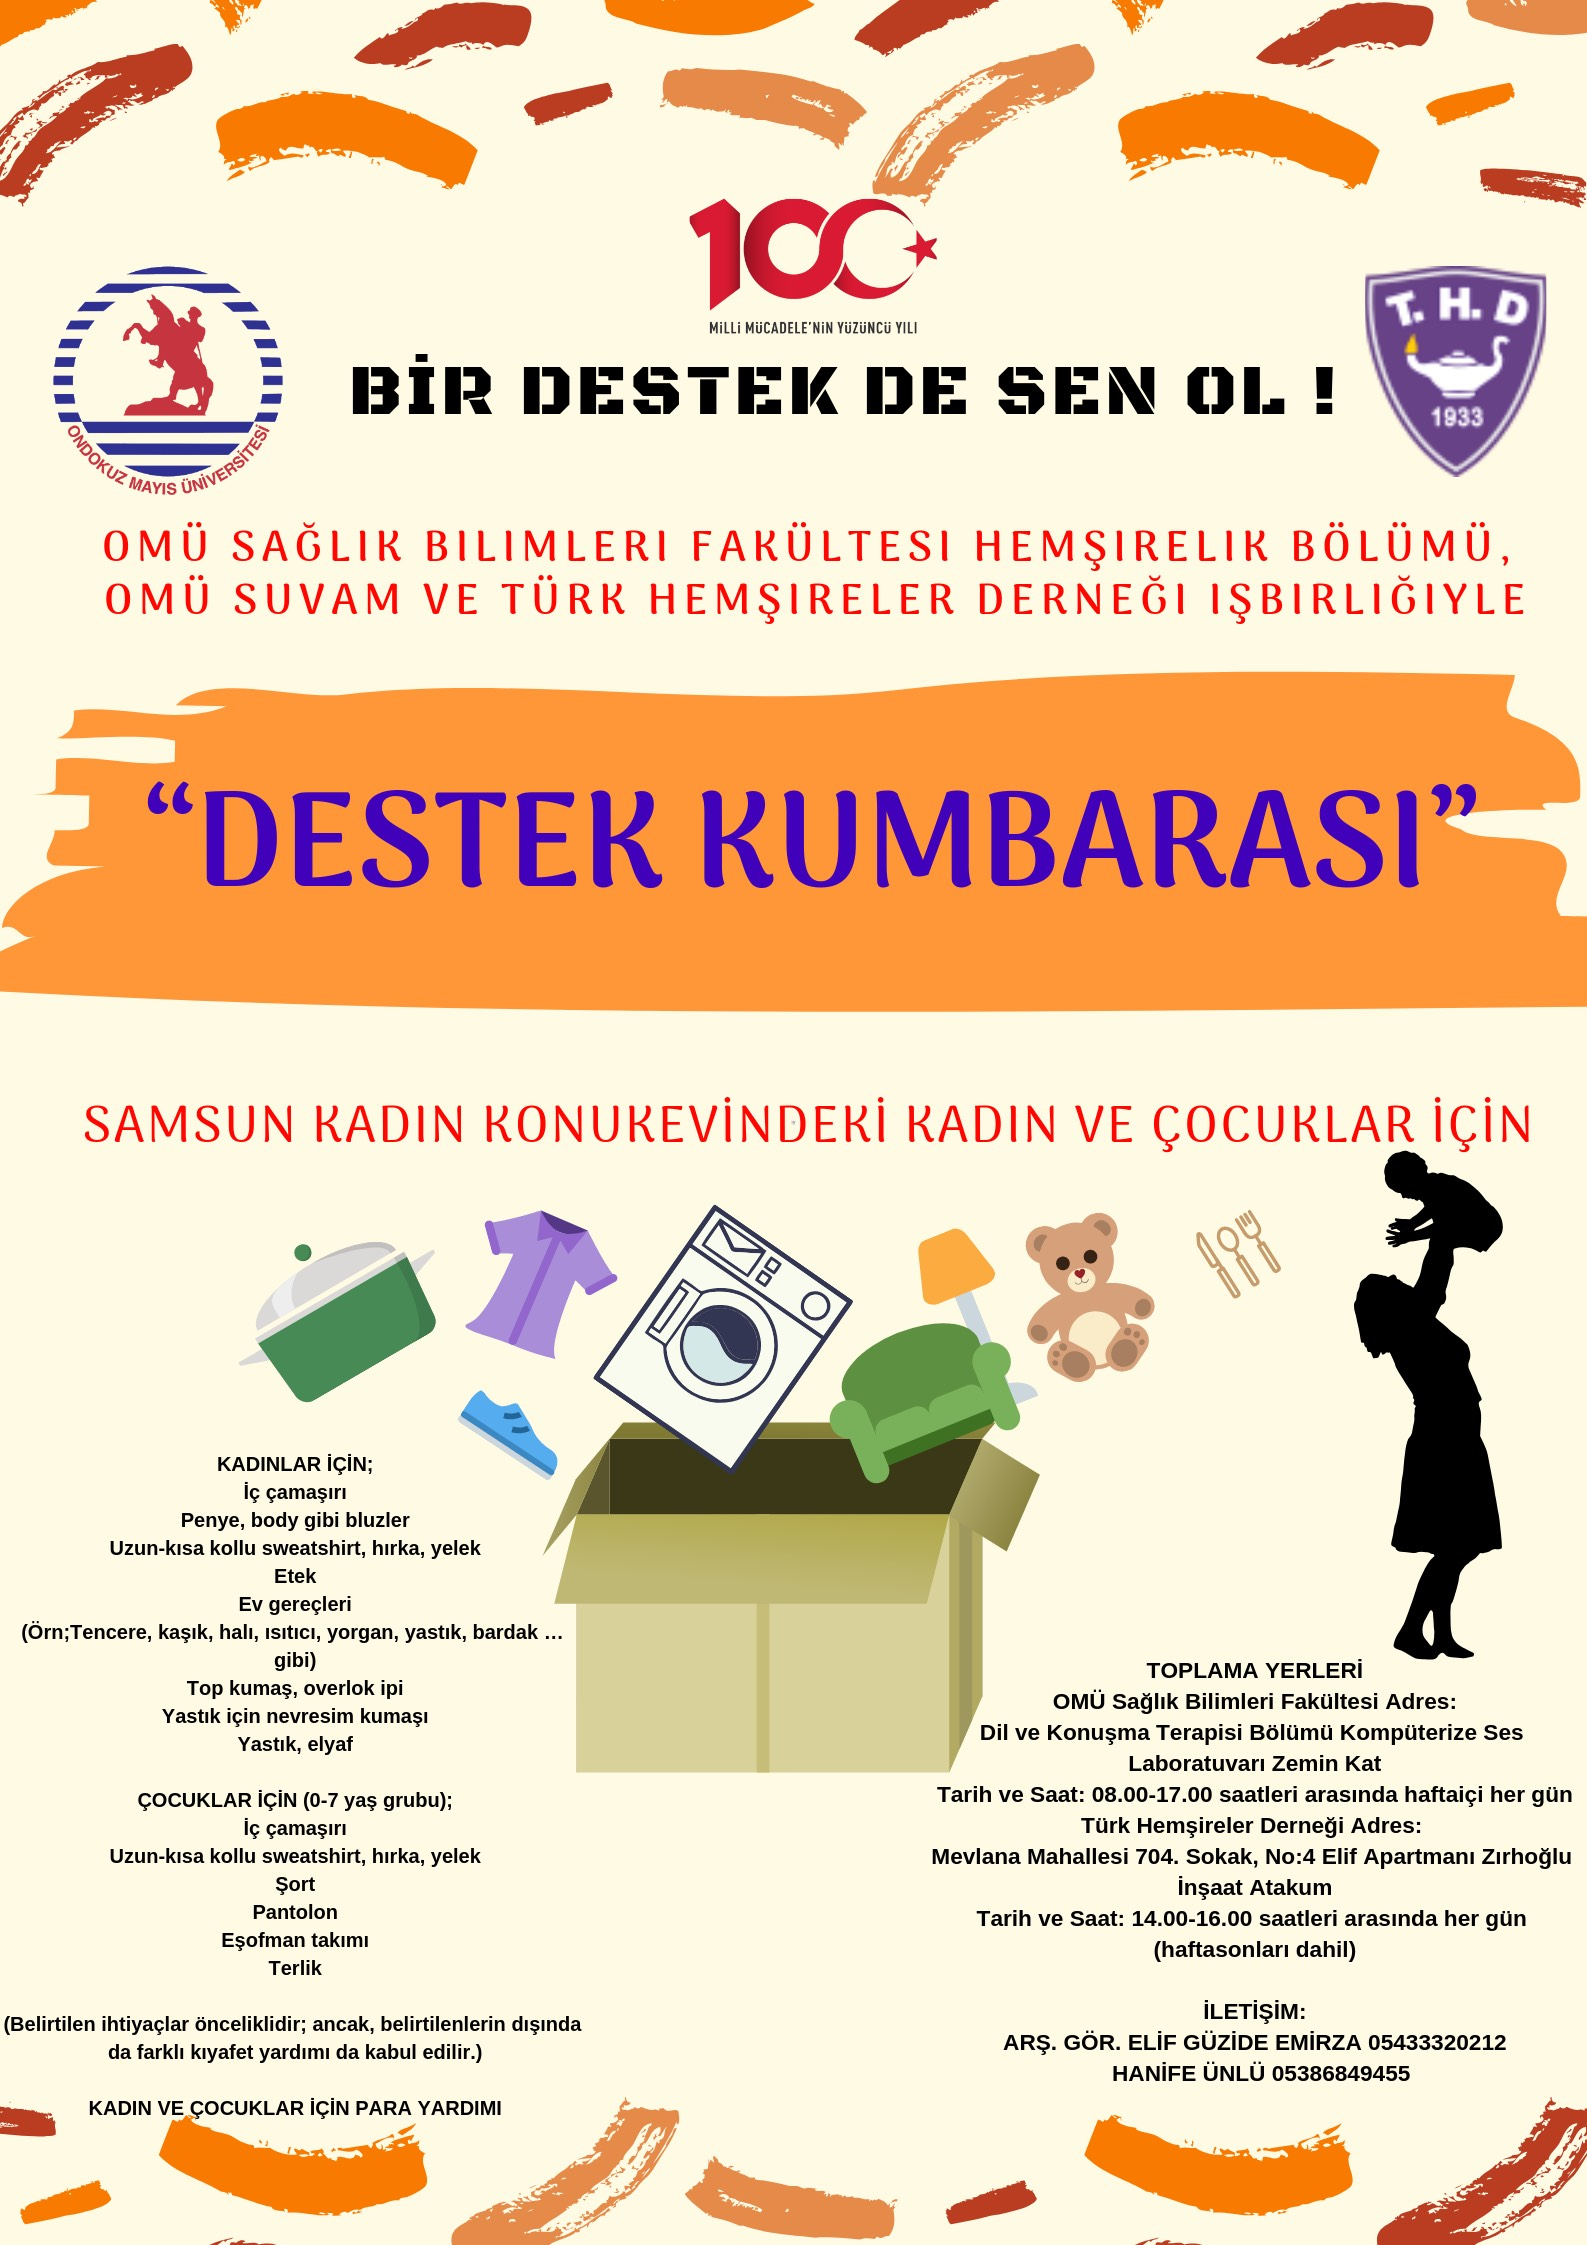 http://www.omu.edu.tr/sites/default/files/destek_kumbarasi_2.jpg